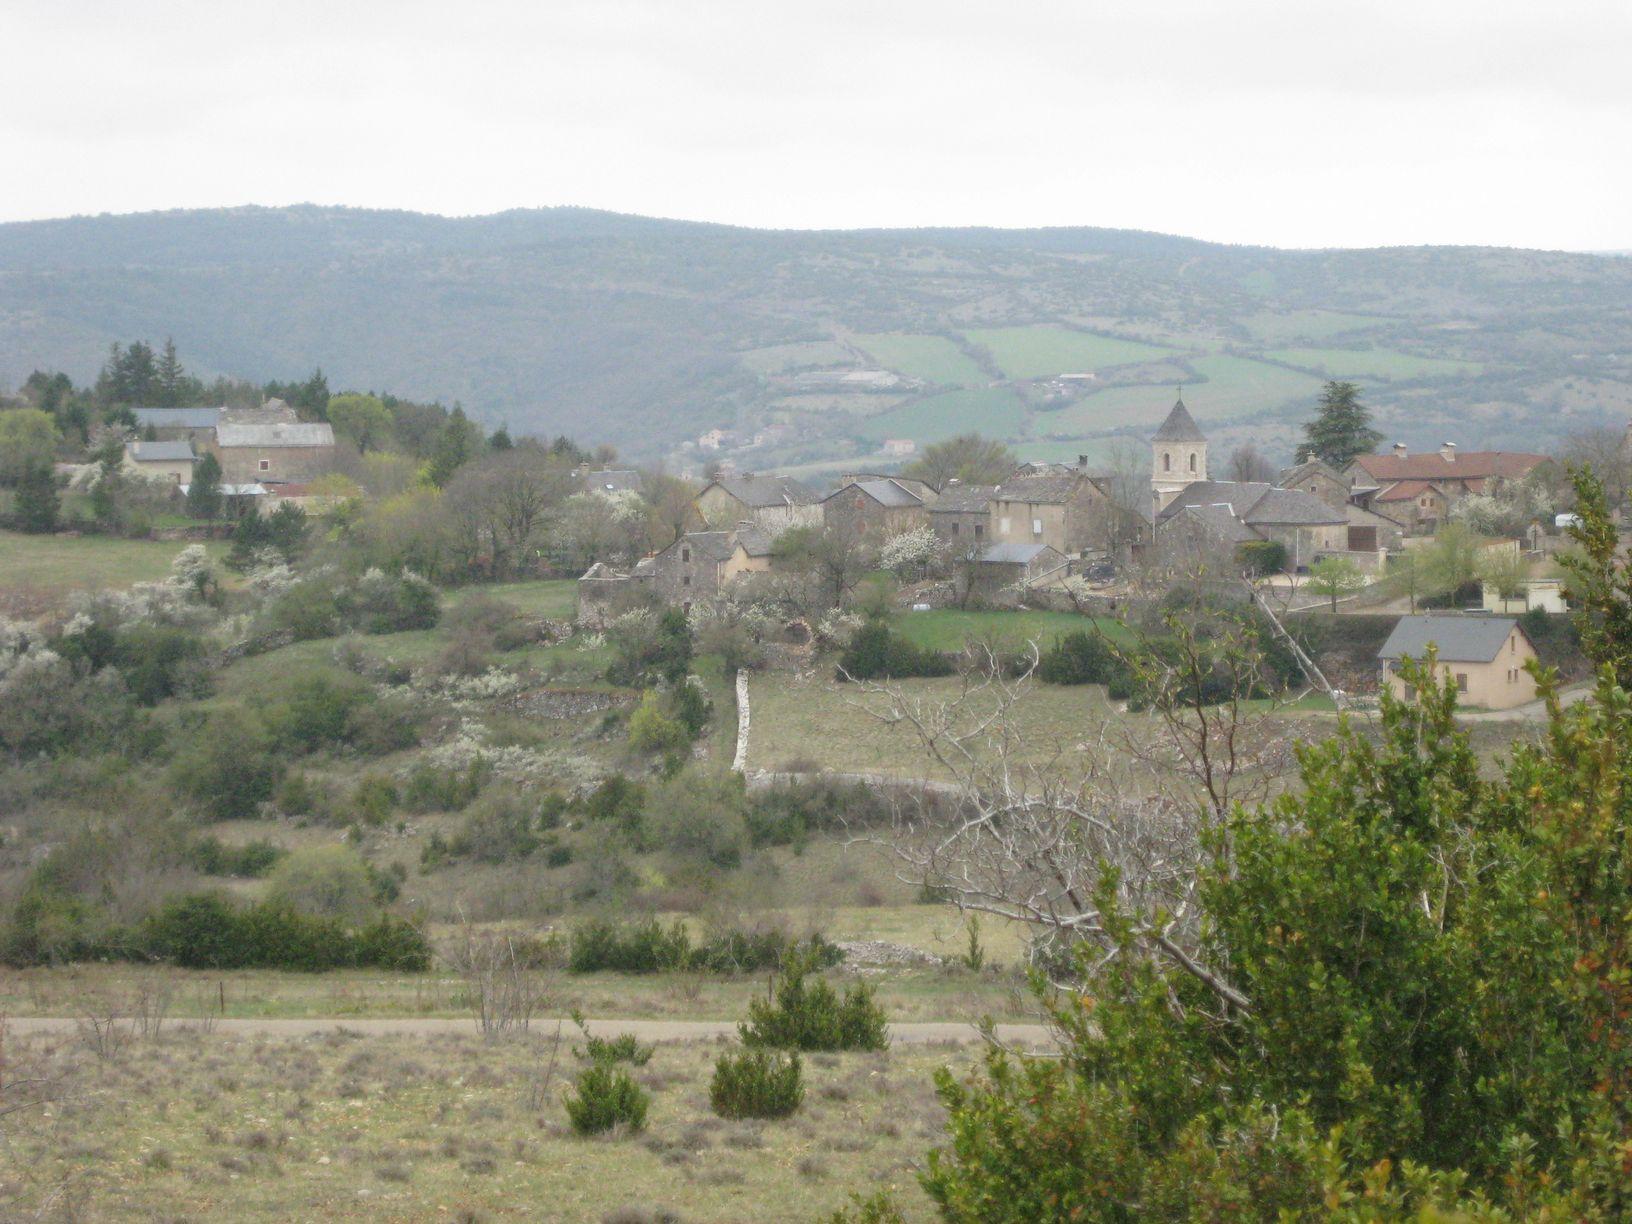 http://www.corambe.com/caminarello/IMG_6194.JPG